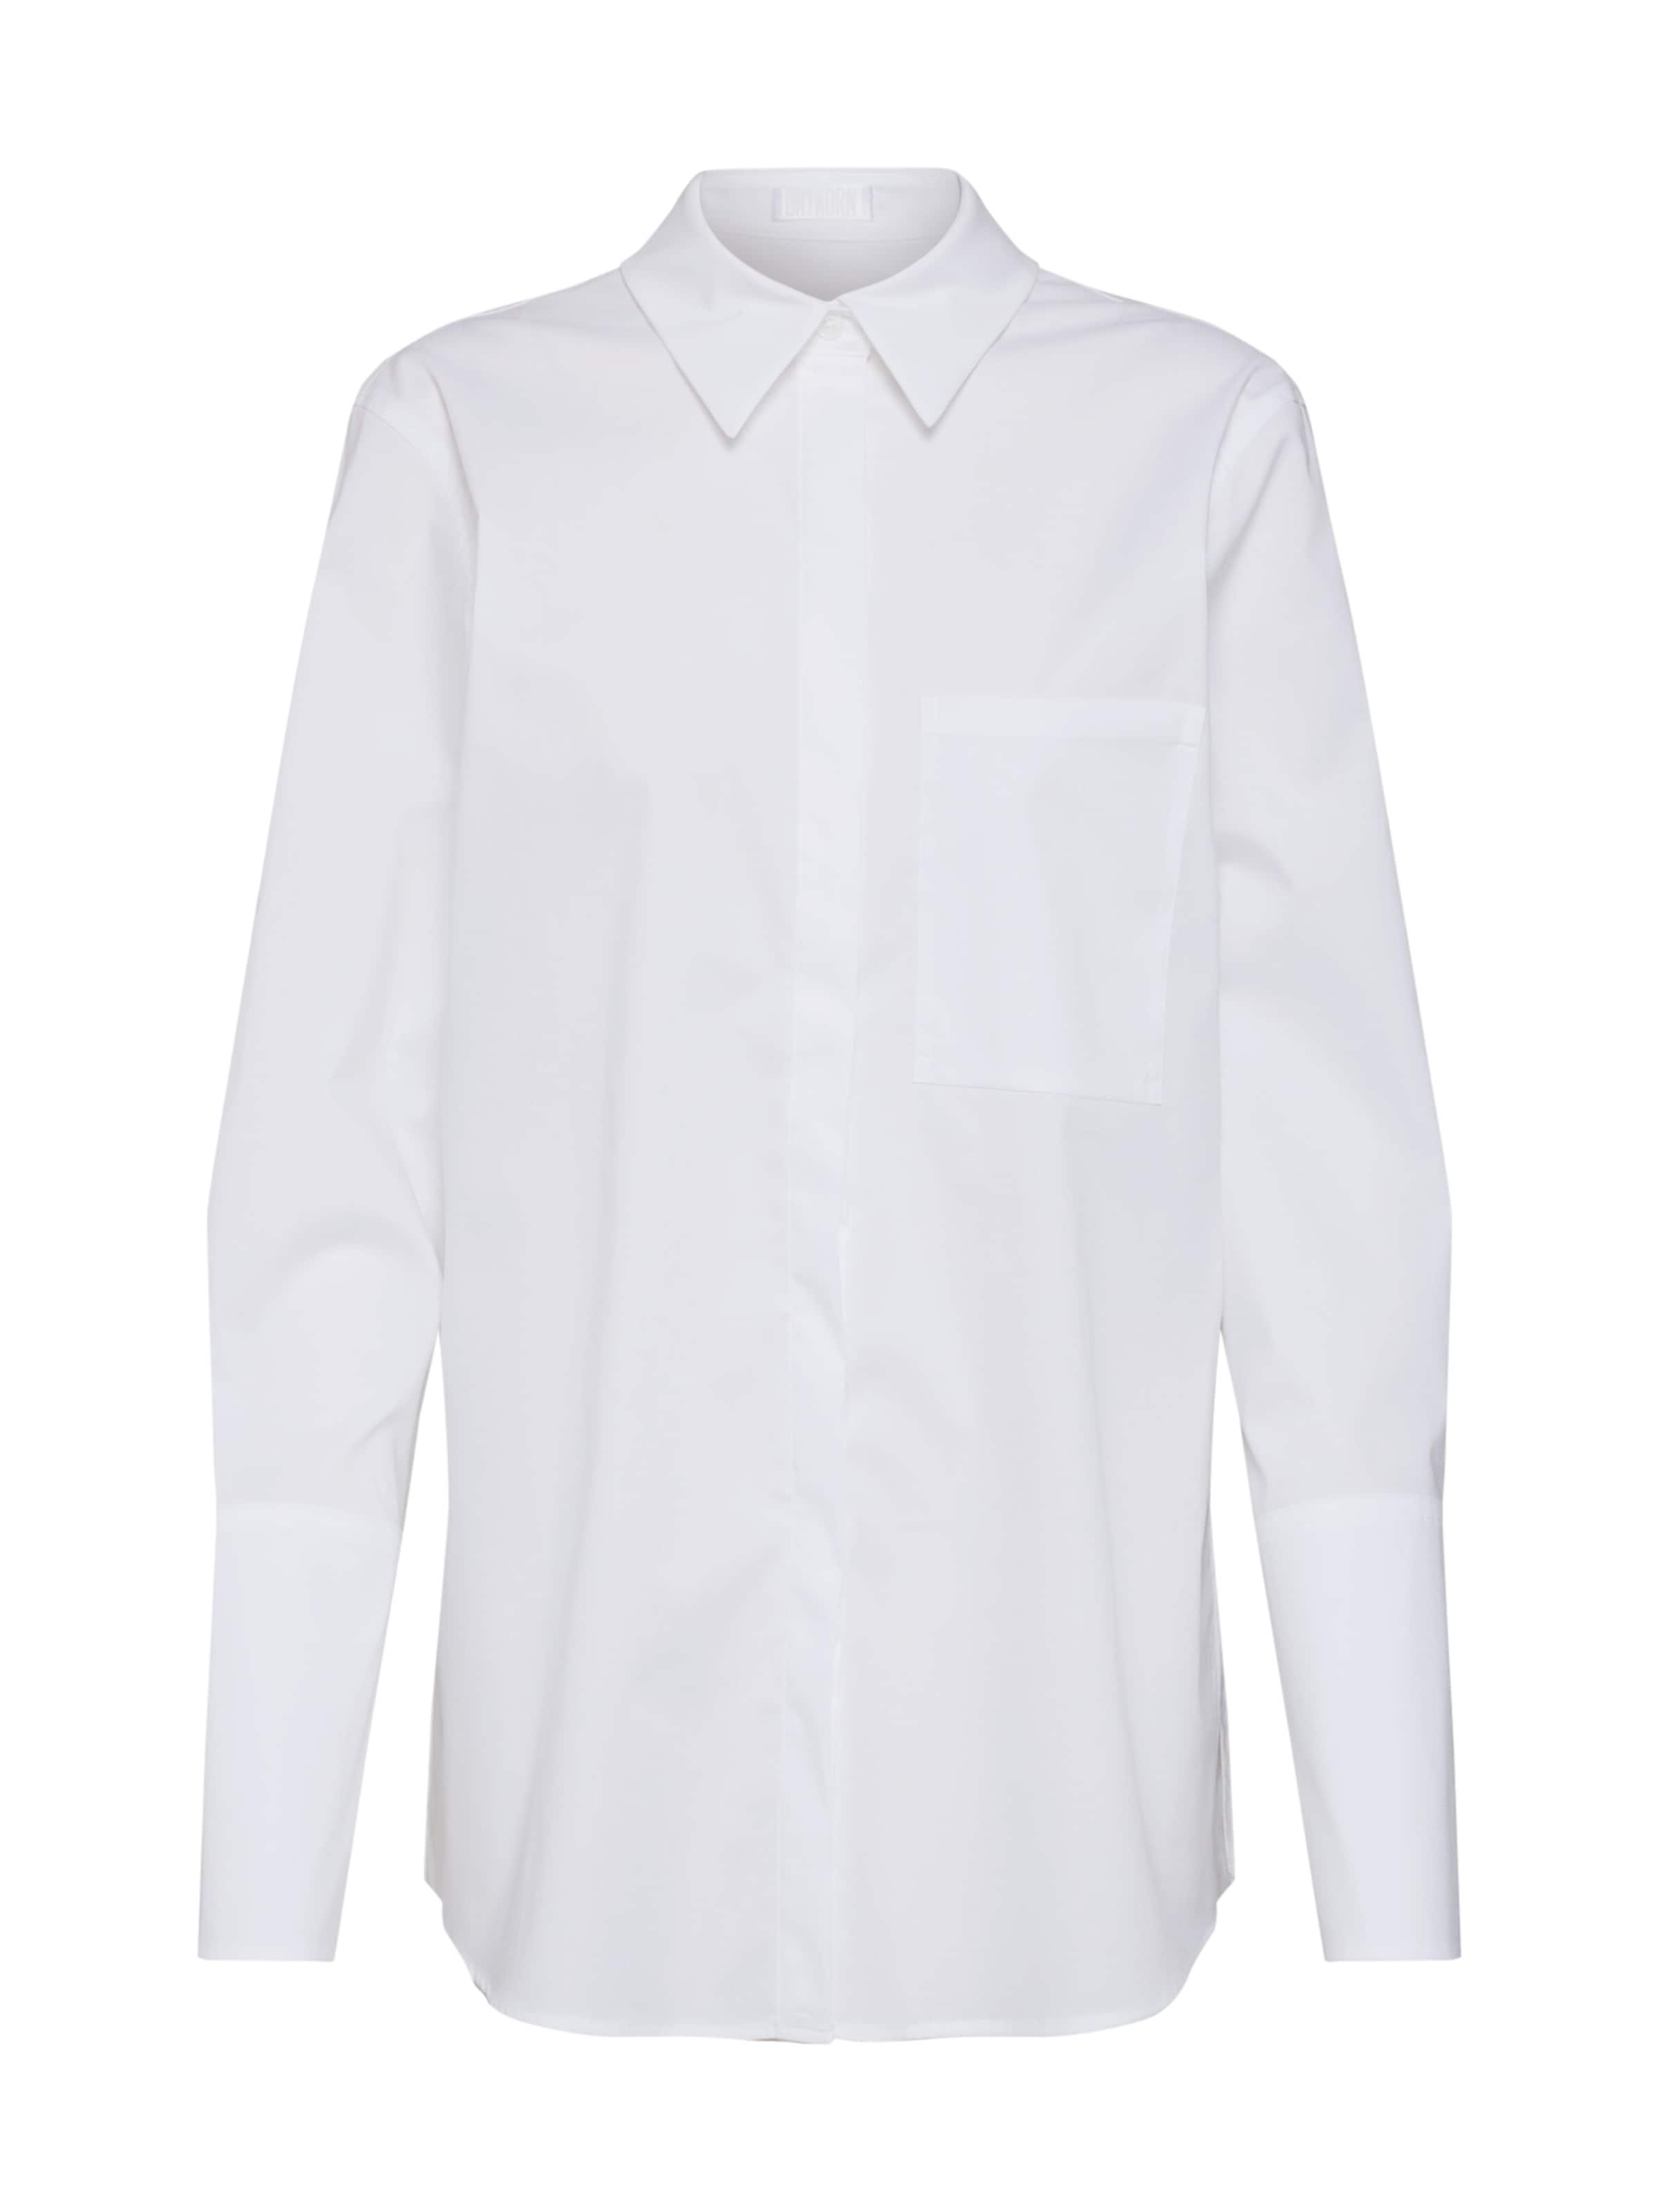 2' Weiß Drykorn Bluse 'charlee In X08wOPnk